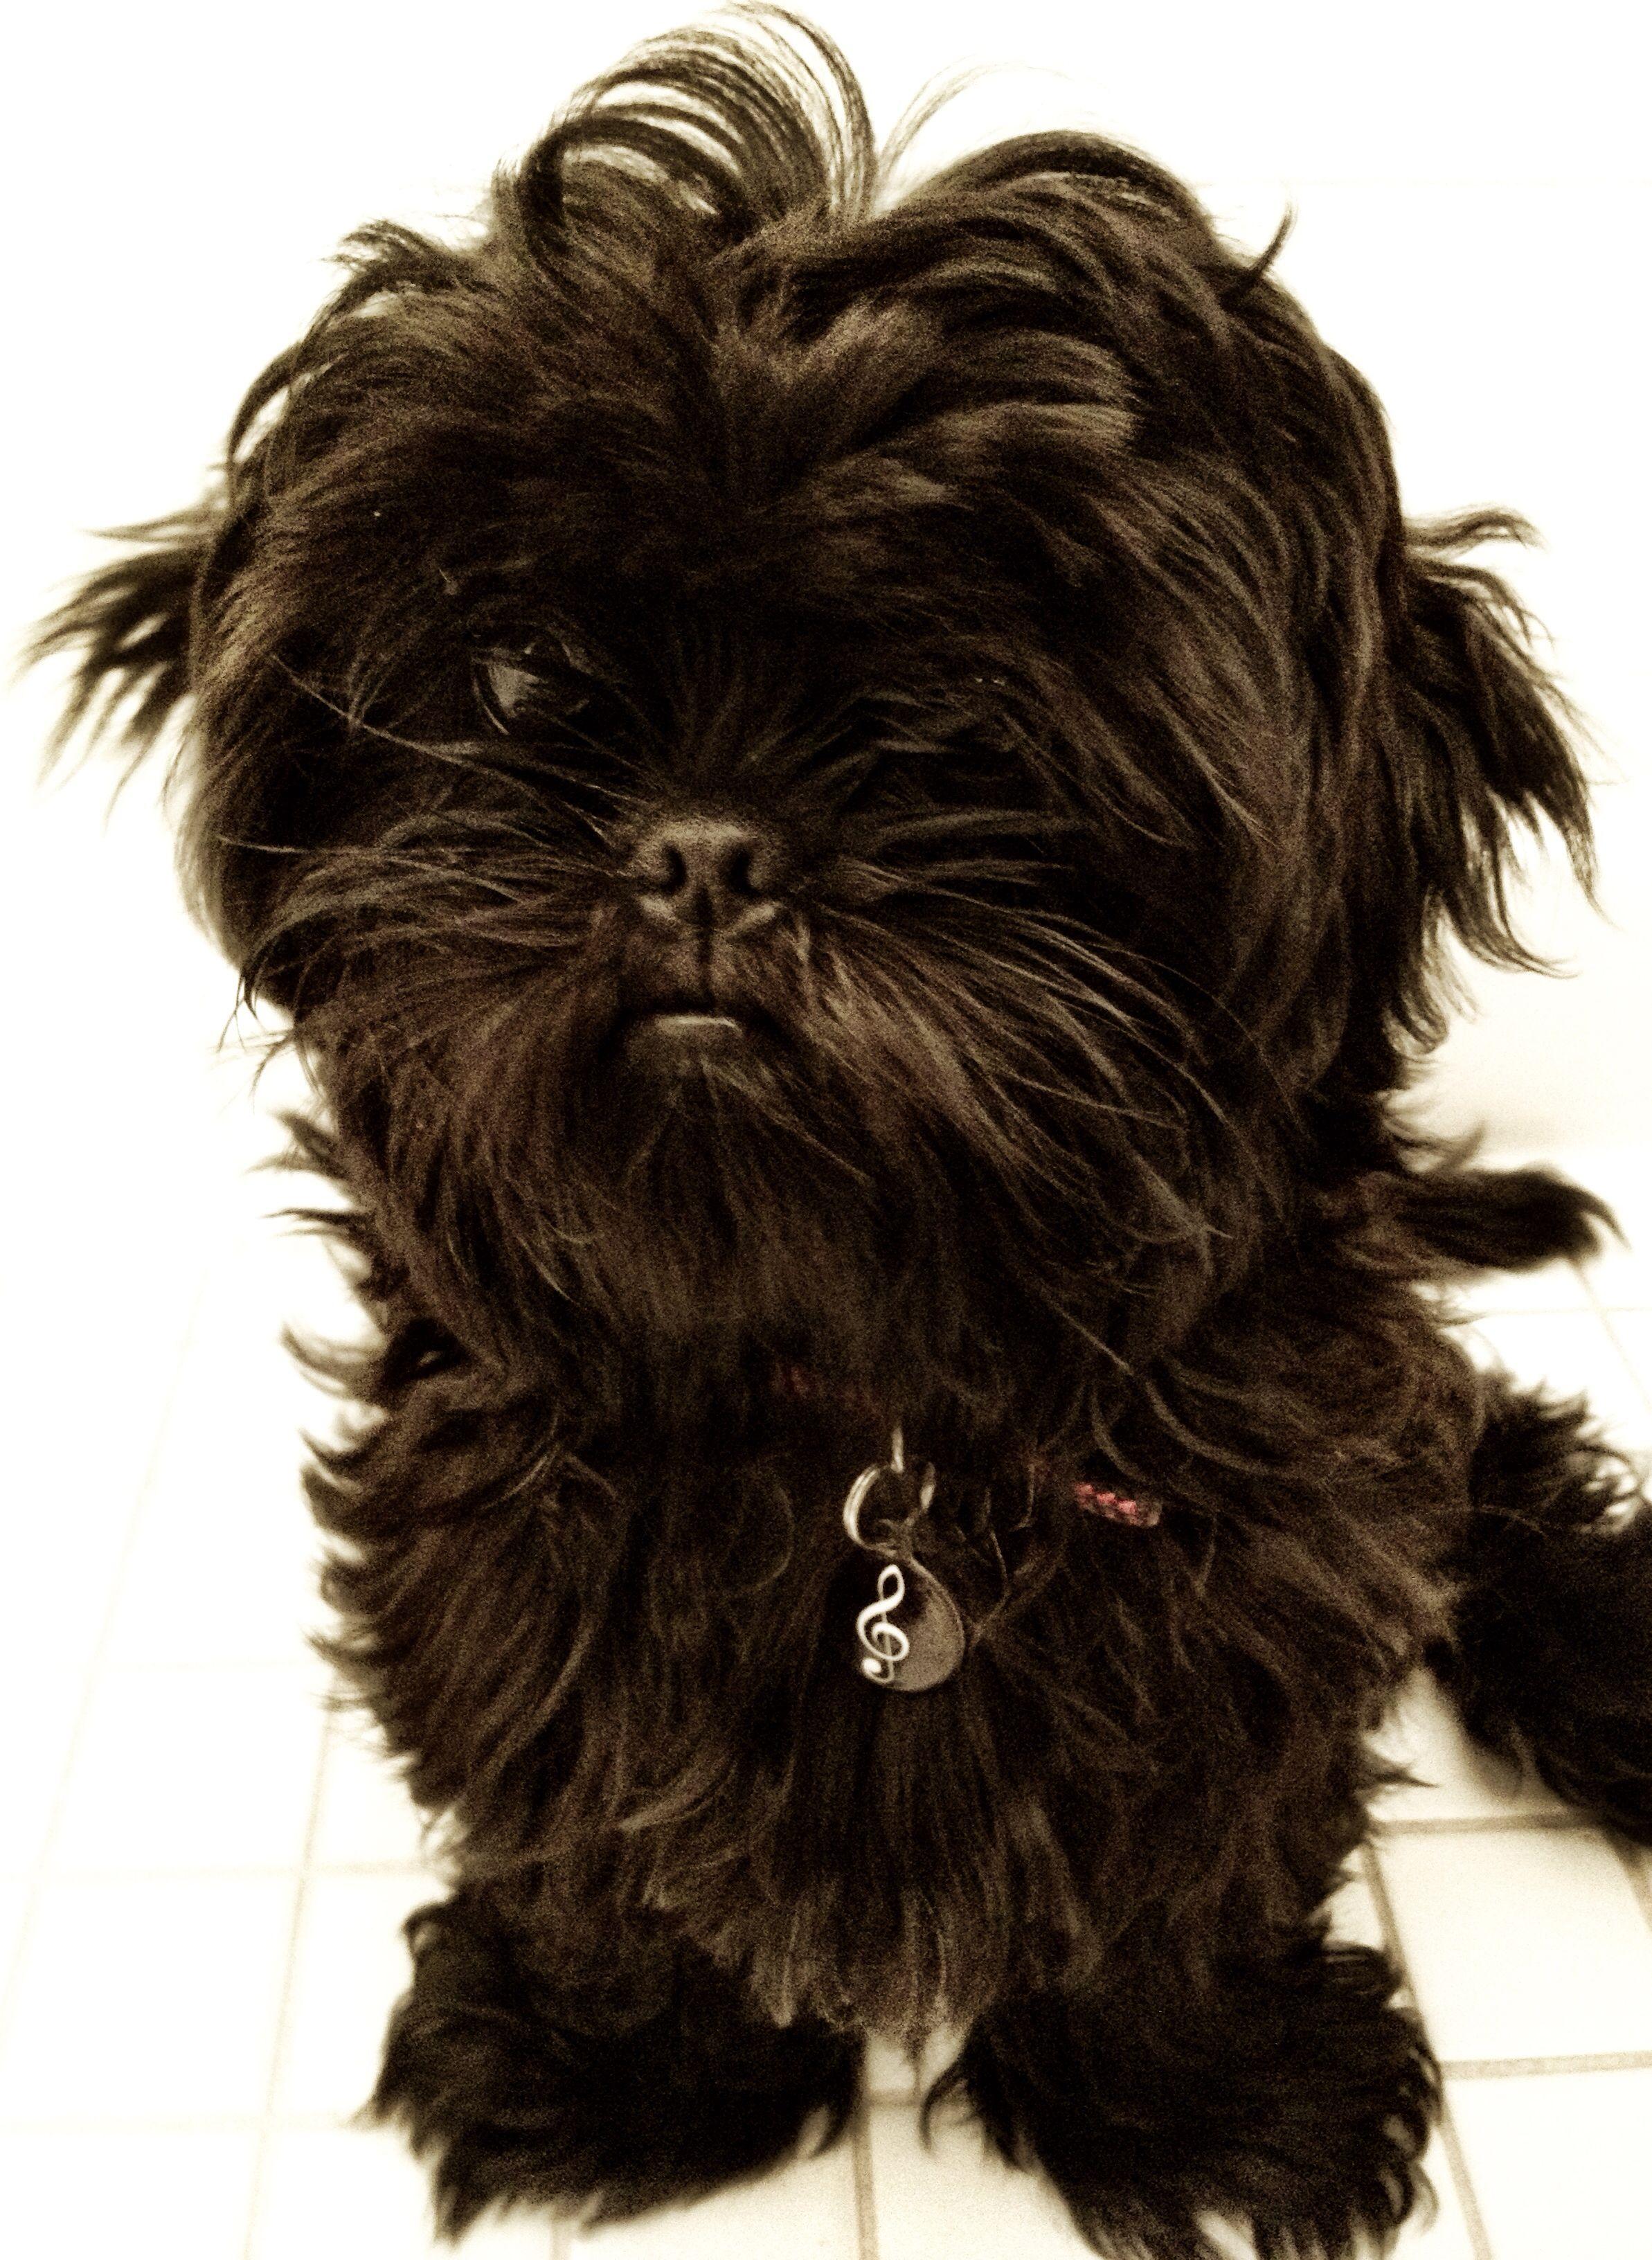 My Dog Rhythm She Is An All Black Shih Tzu Black Shih Tzu